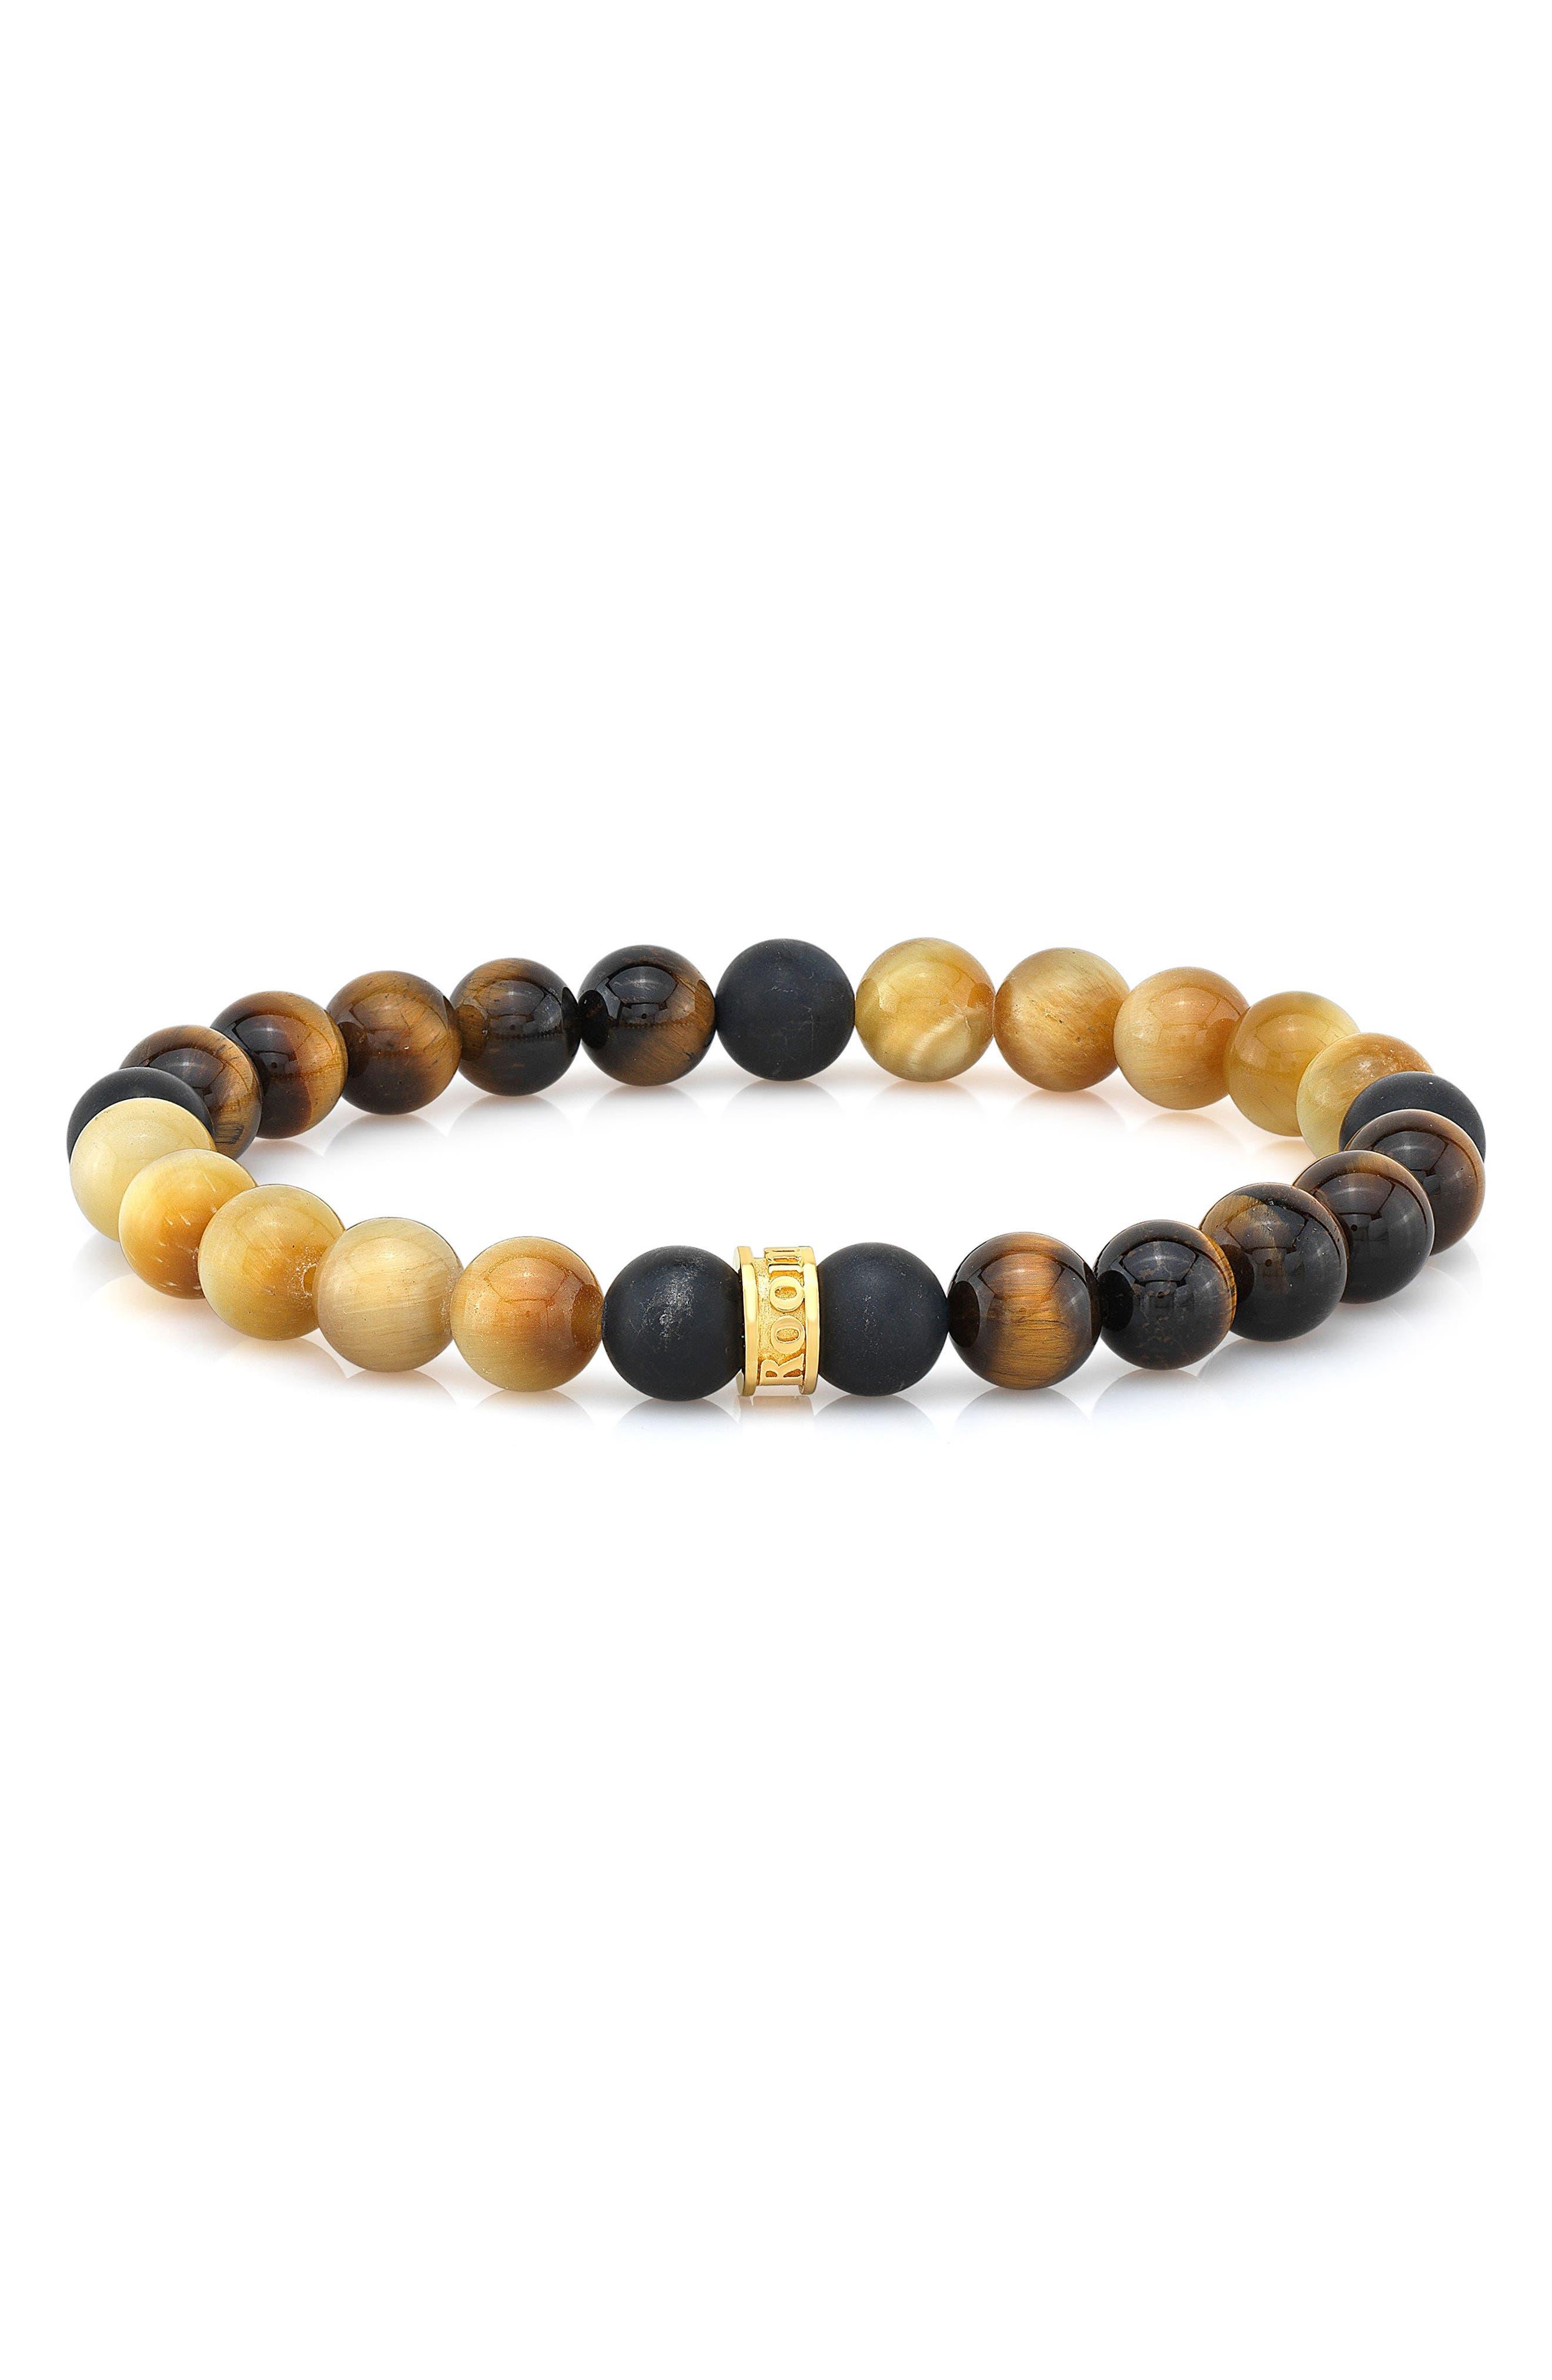 Tiger's Eye & Agate Bead Bracelet,                             Main thumbnail 1, color,                             Gold/ Brown/ Black